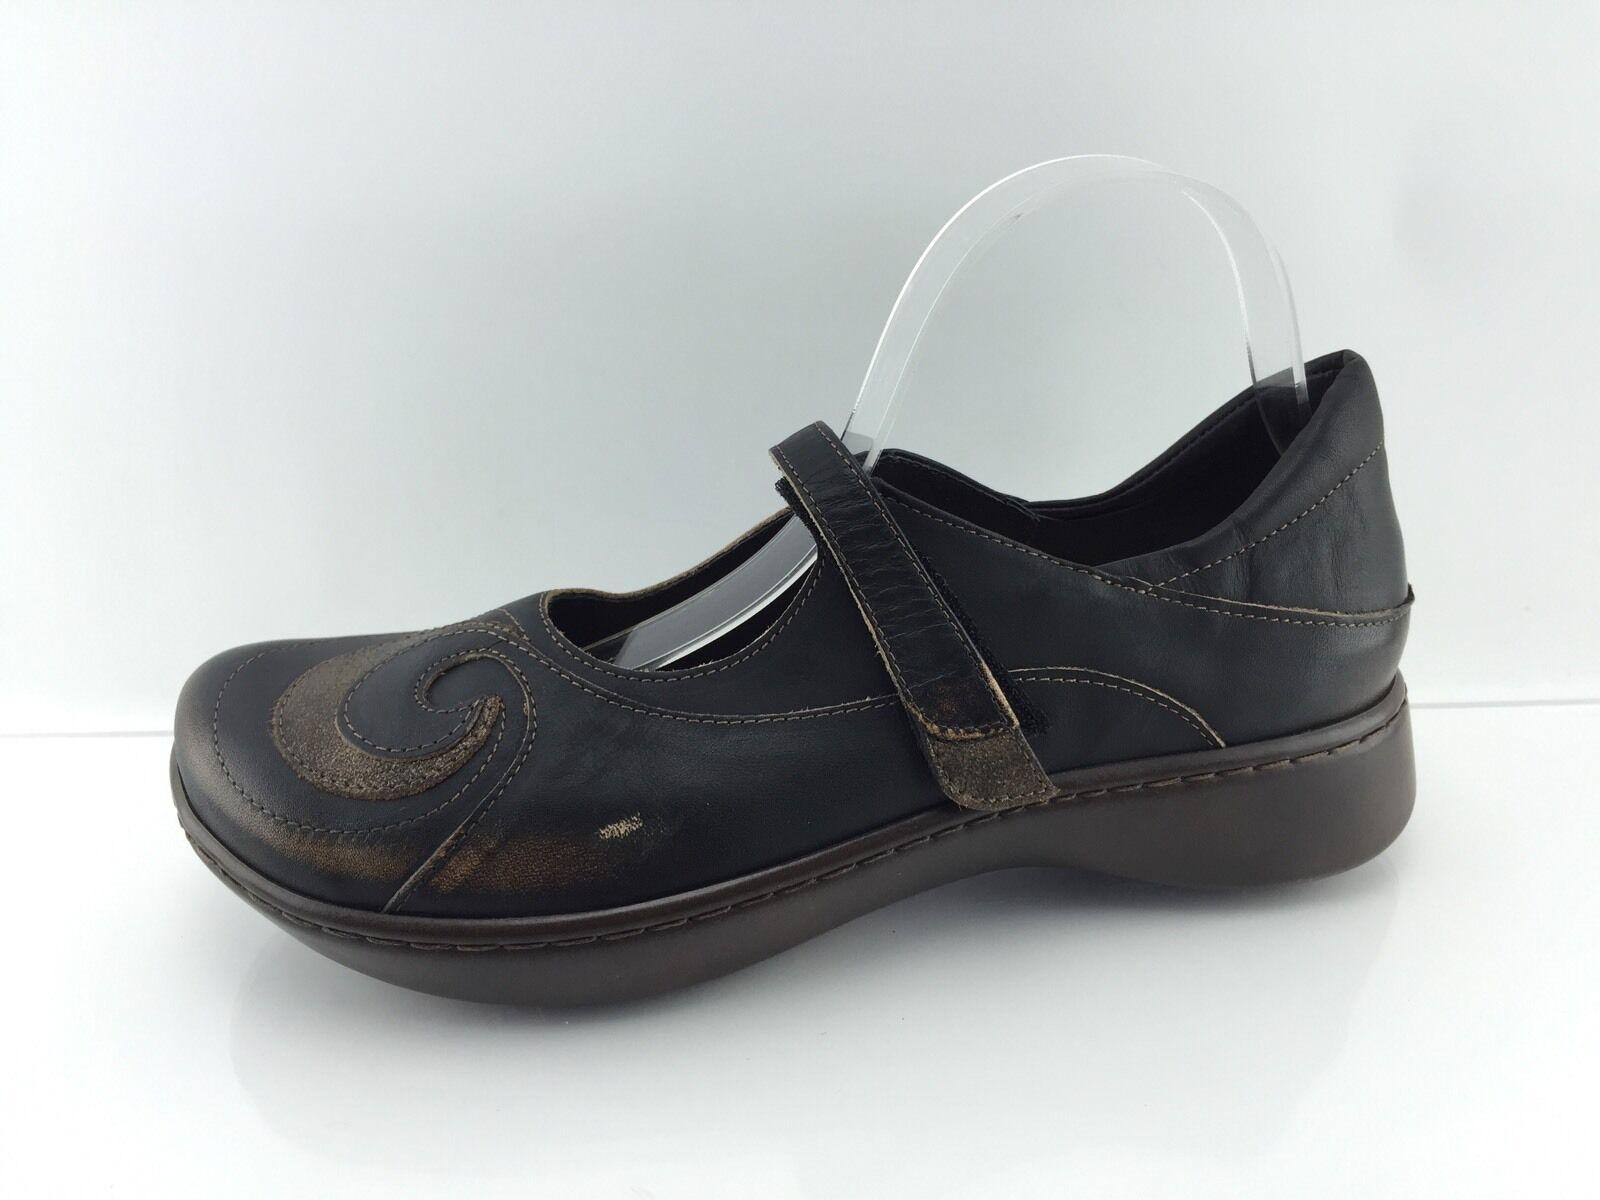 186 Naot 'Sea' Women's Bronze-Dark Brown off Black shoes 11